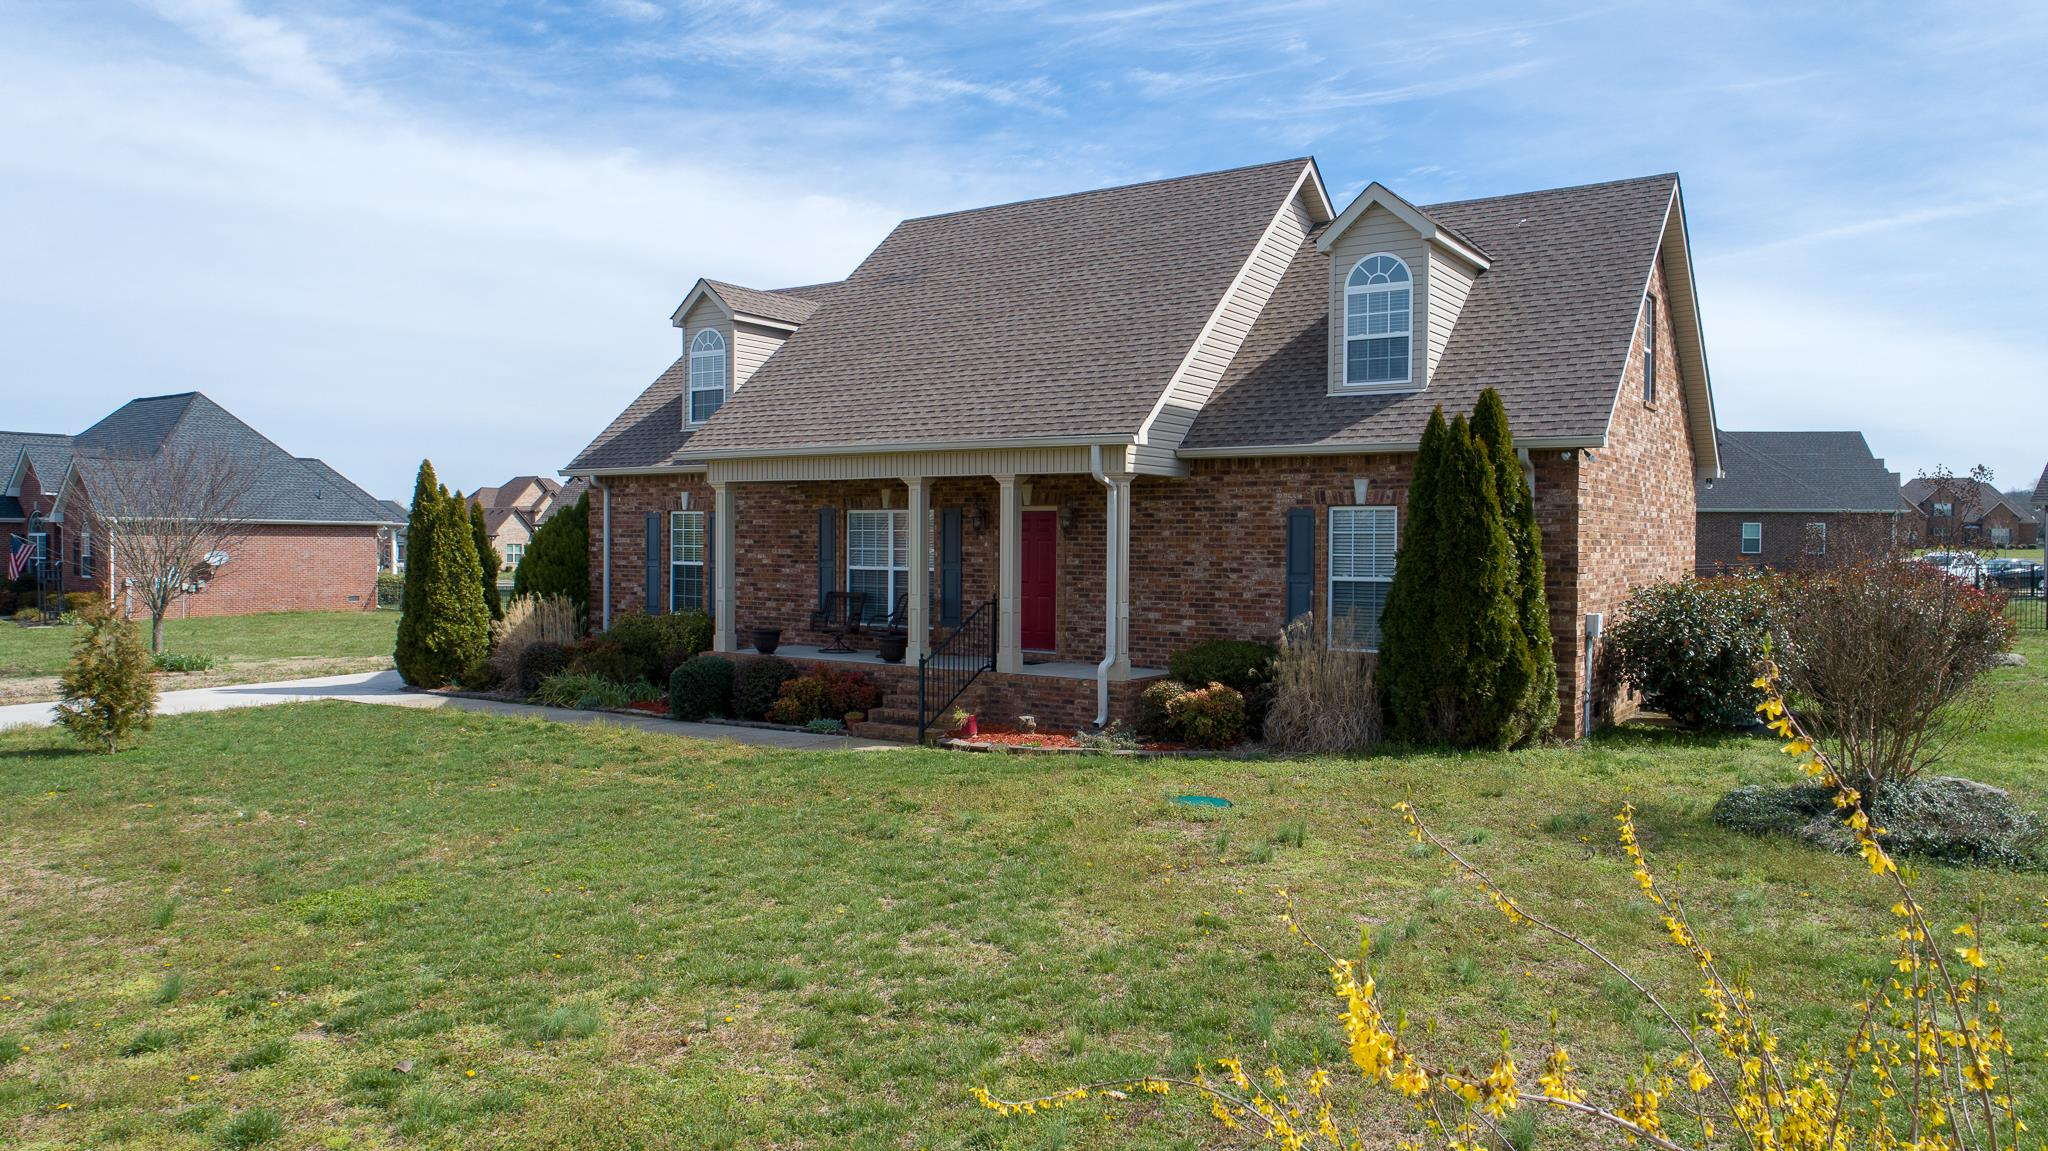 1010 Renee Dr, Christiana, TN 37037 - Christiana, TN real estate listing